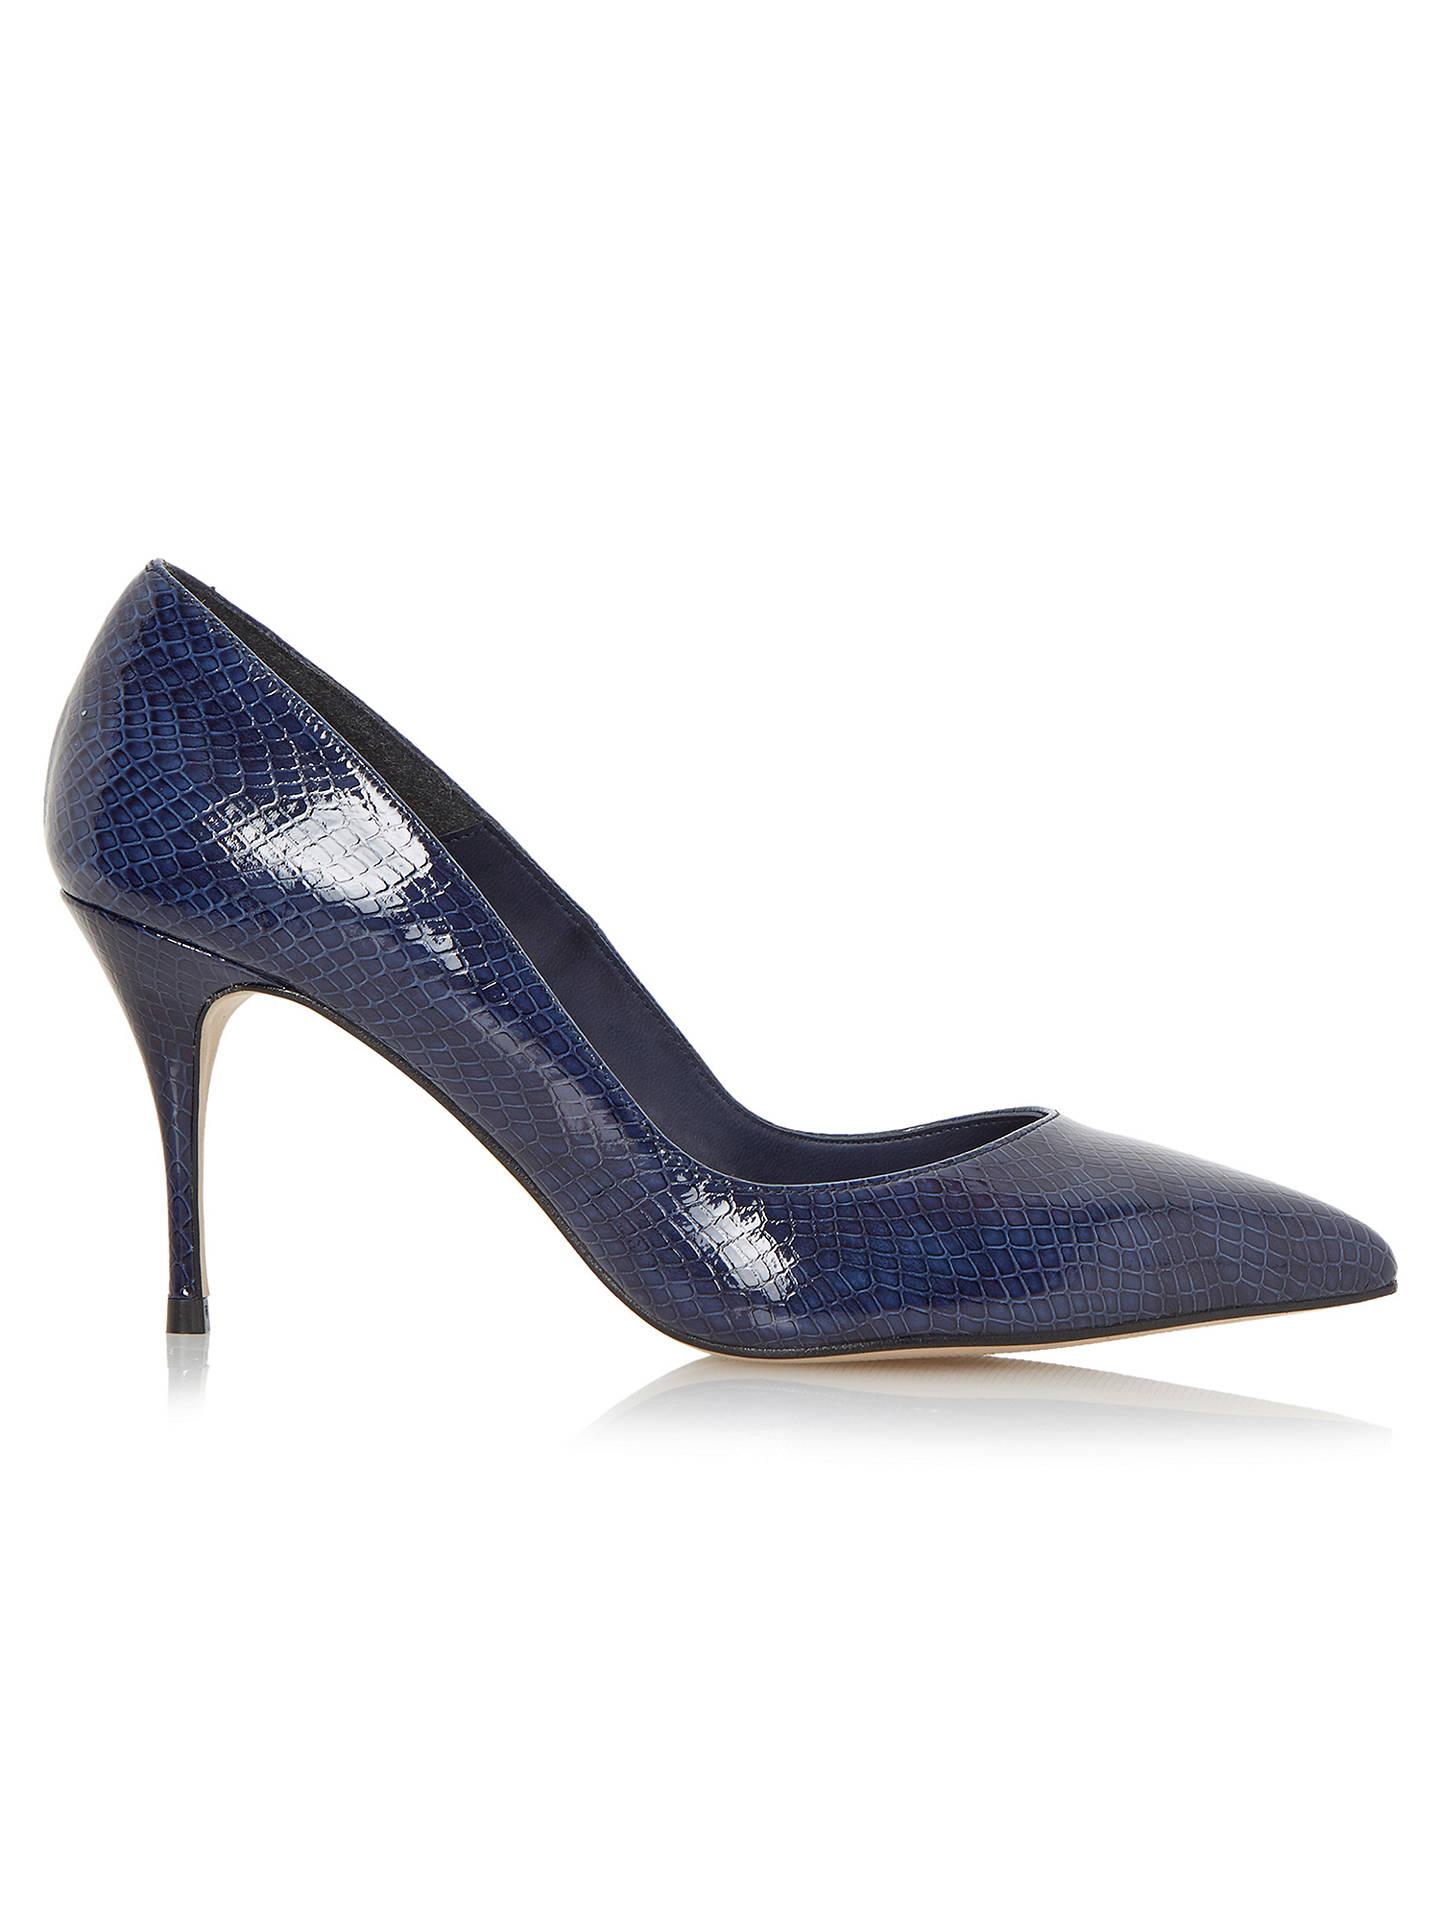 4e4ebd49ed9 Dune Ashlyn High Heeled Stiletto Court Shoes at John Lewis & Partners